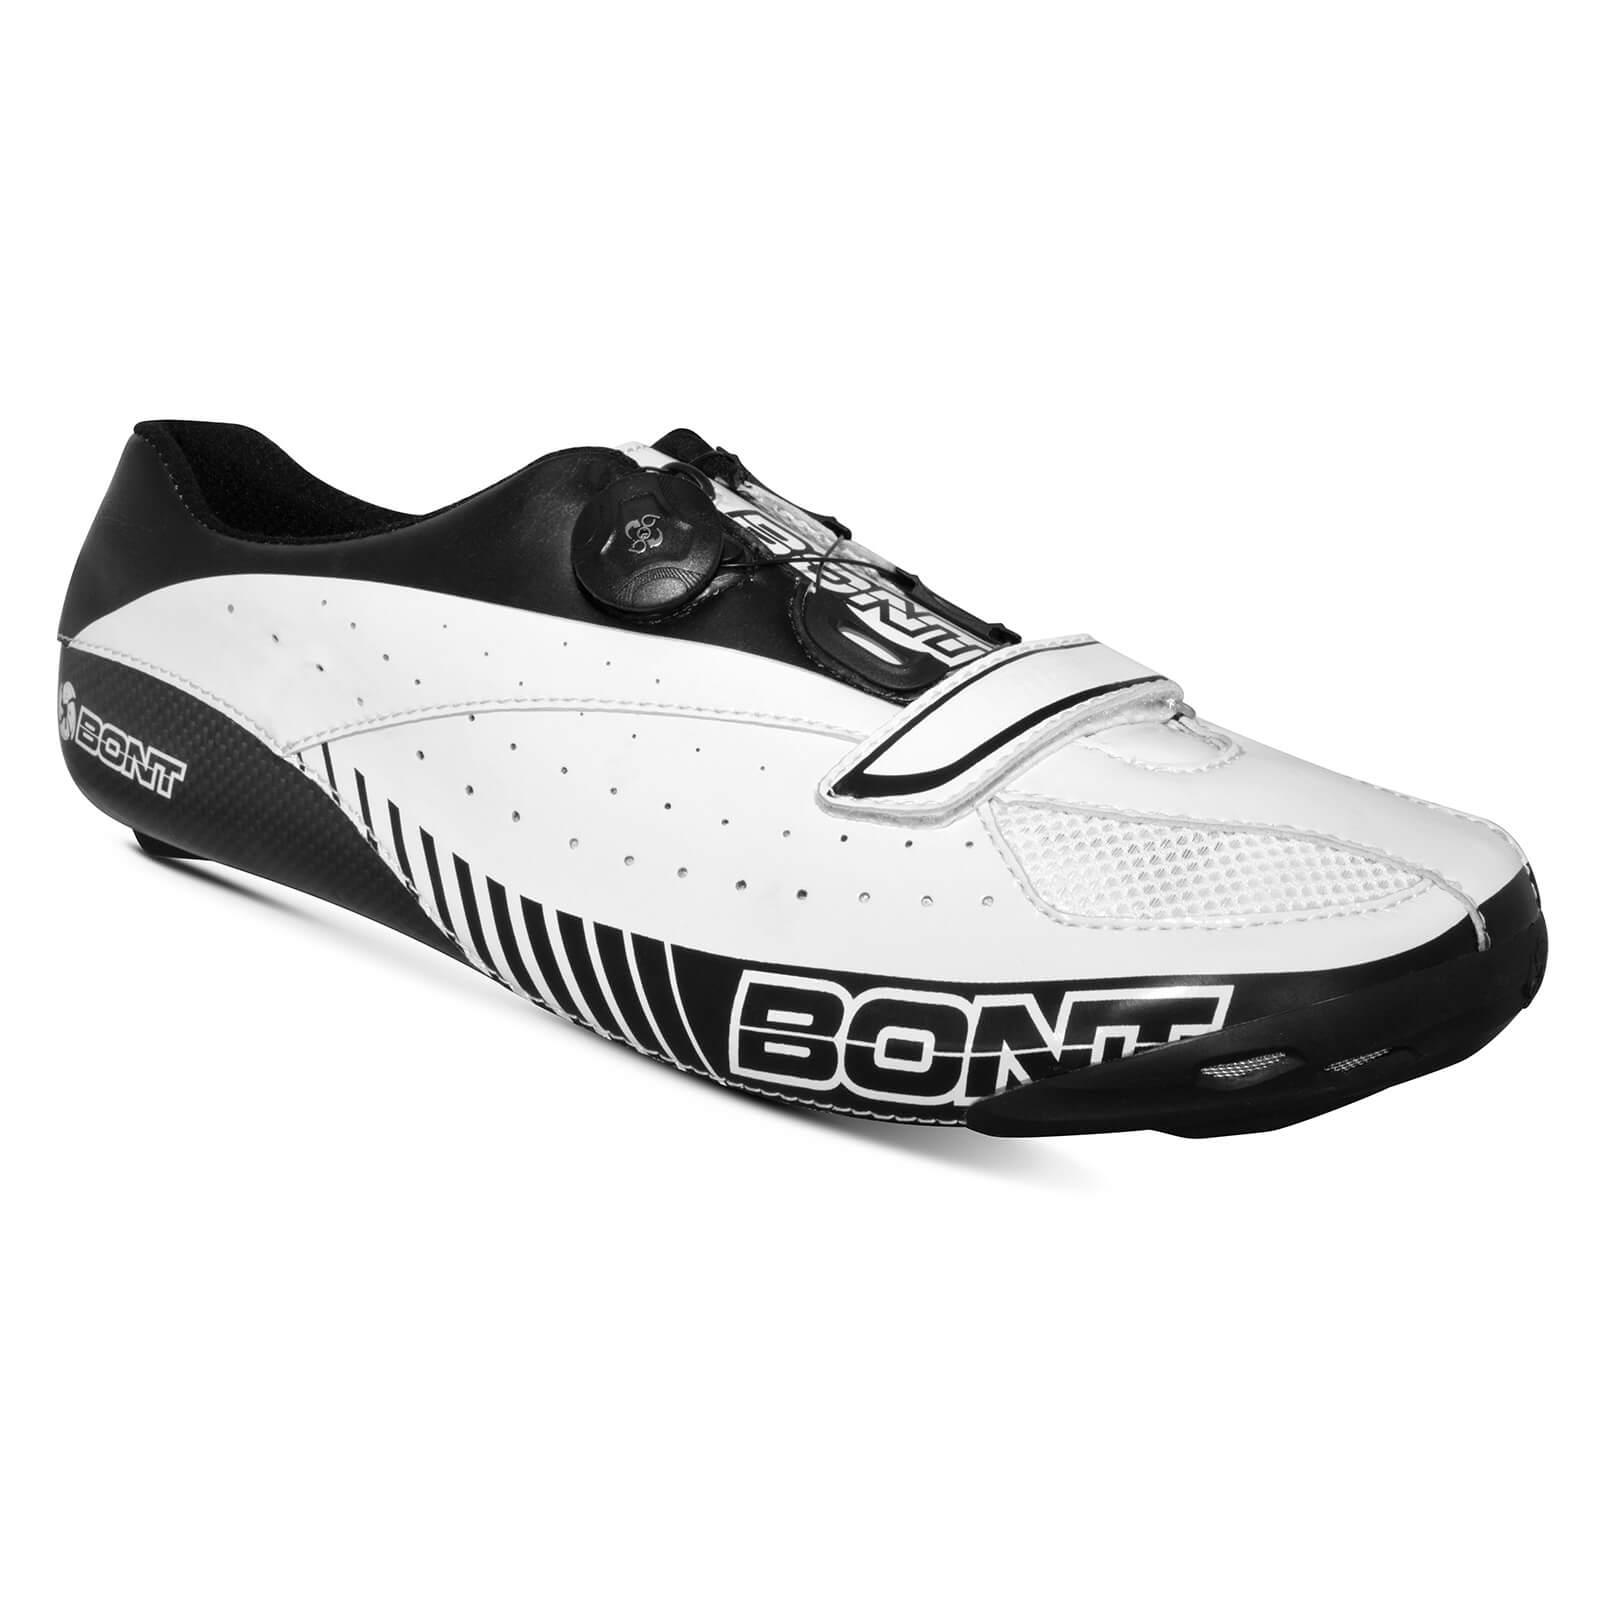 Bont Blitz Road Shoes - EU 44 - White/Black